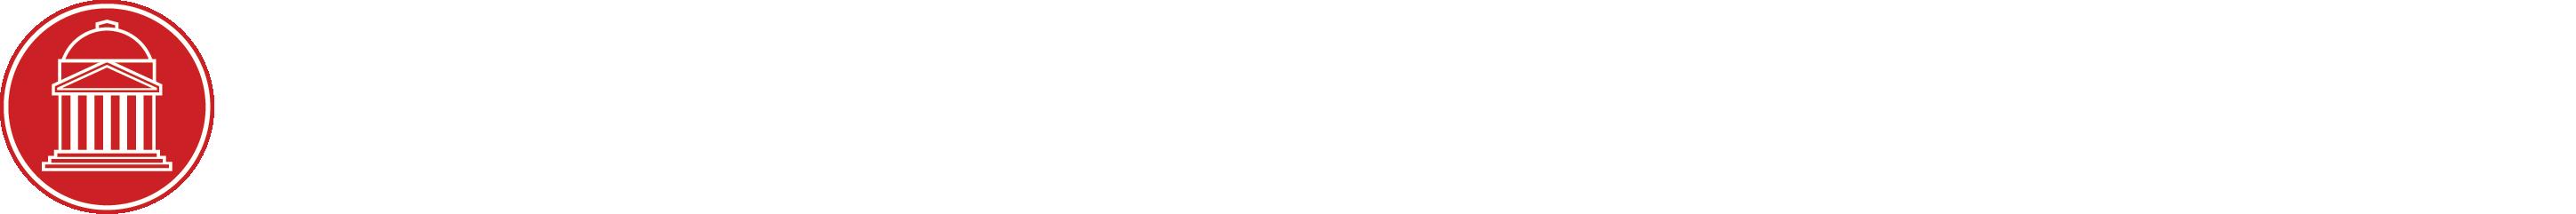 grad-studies-logo.png